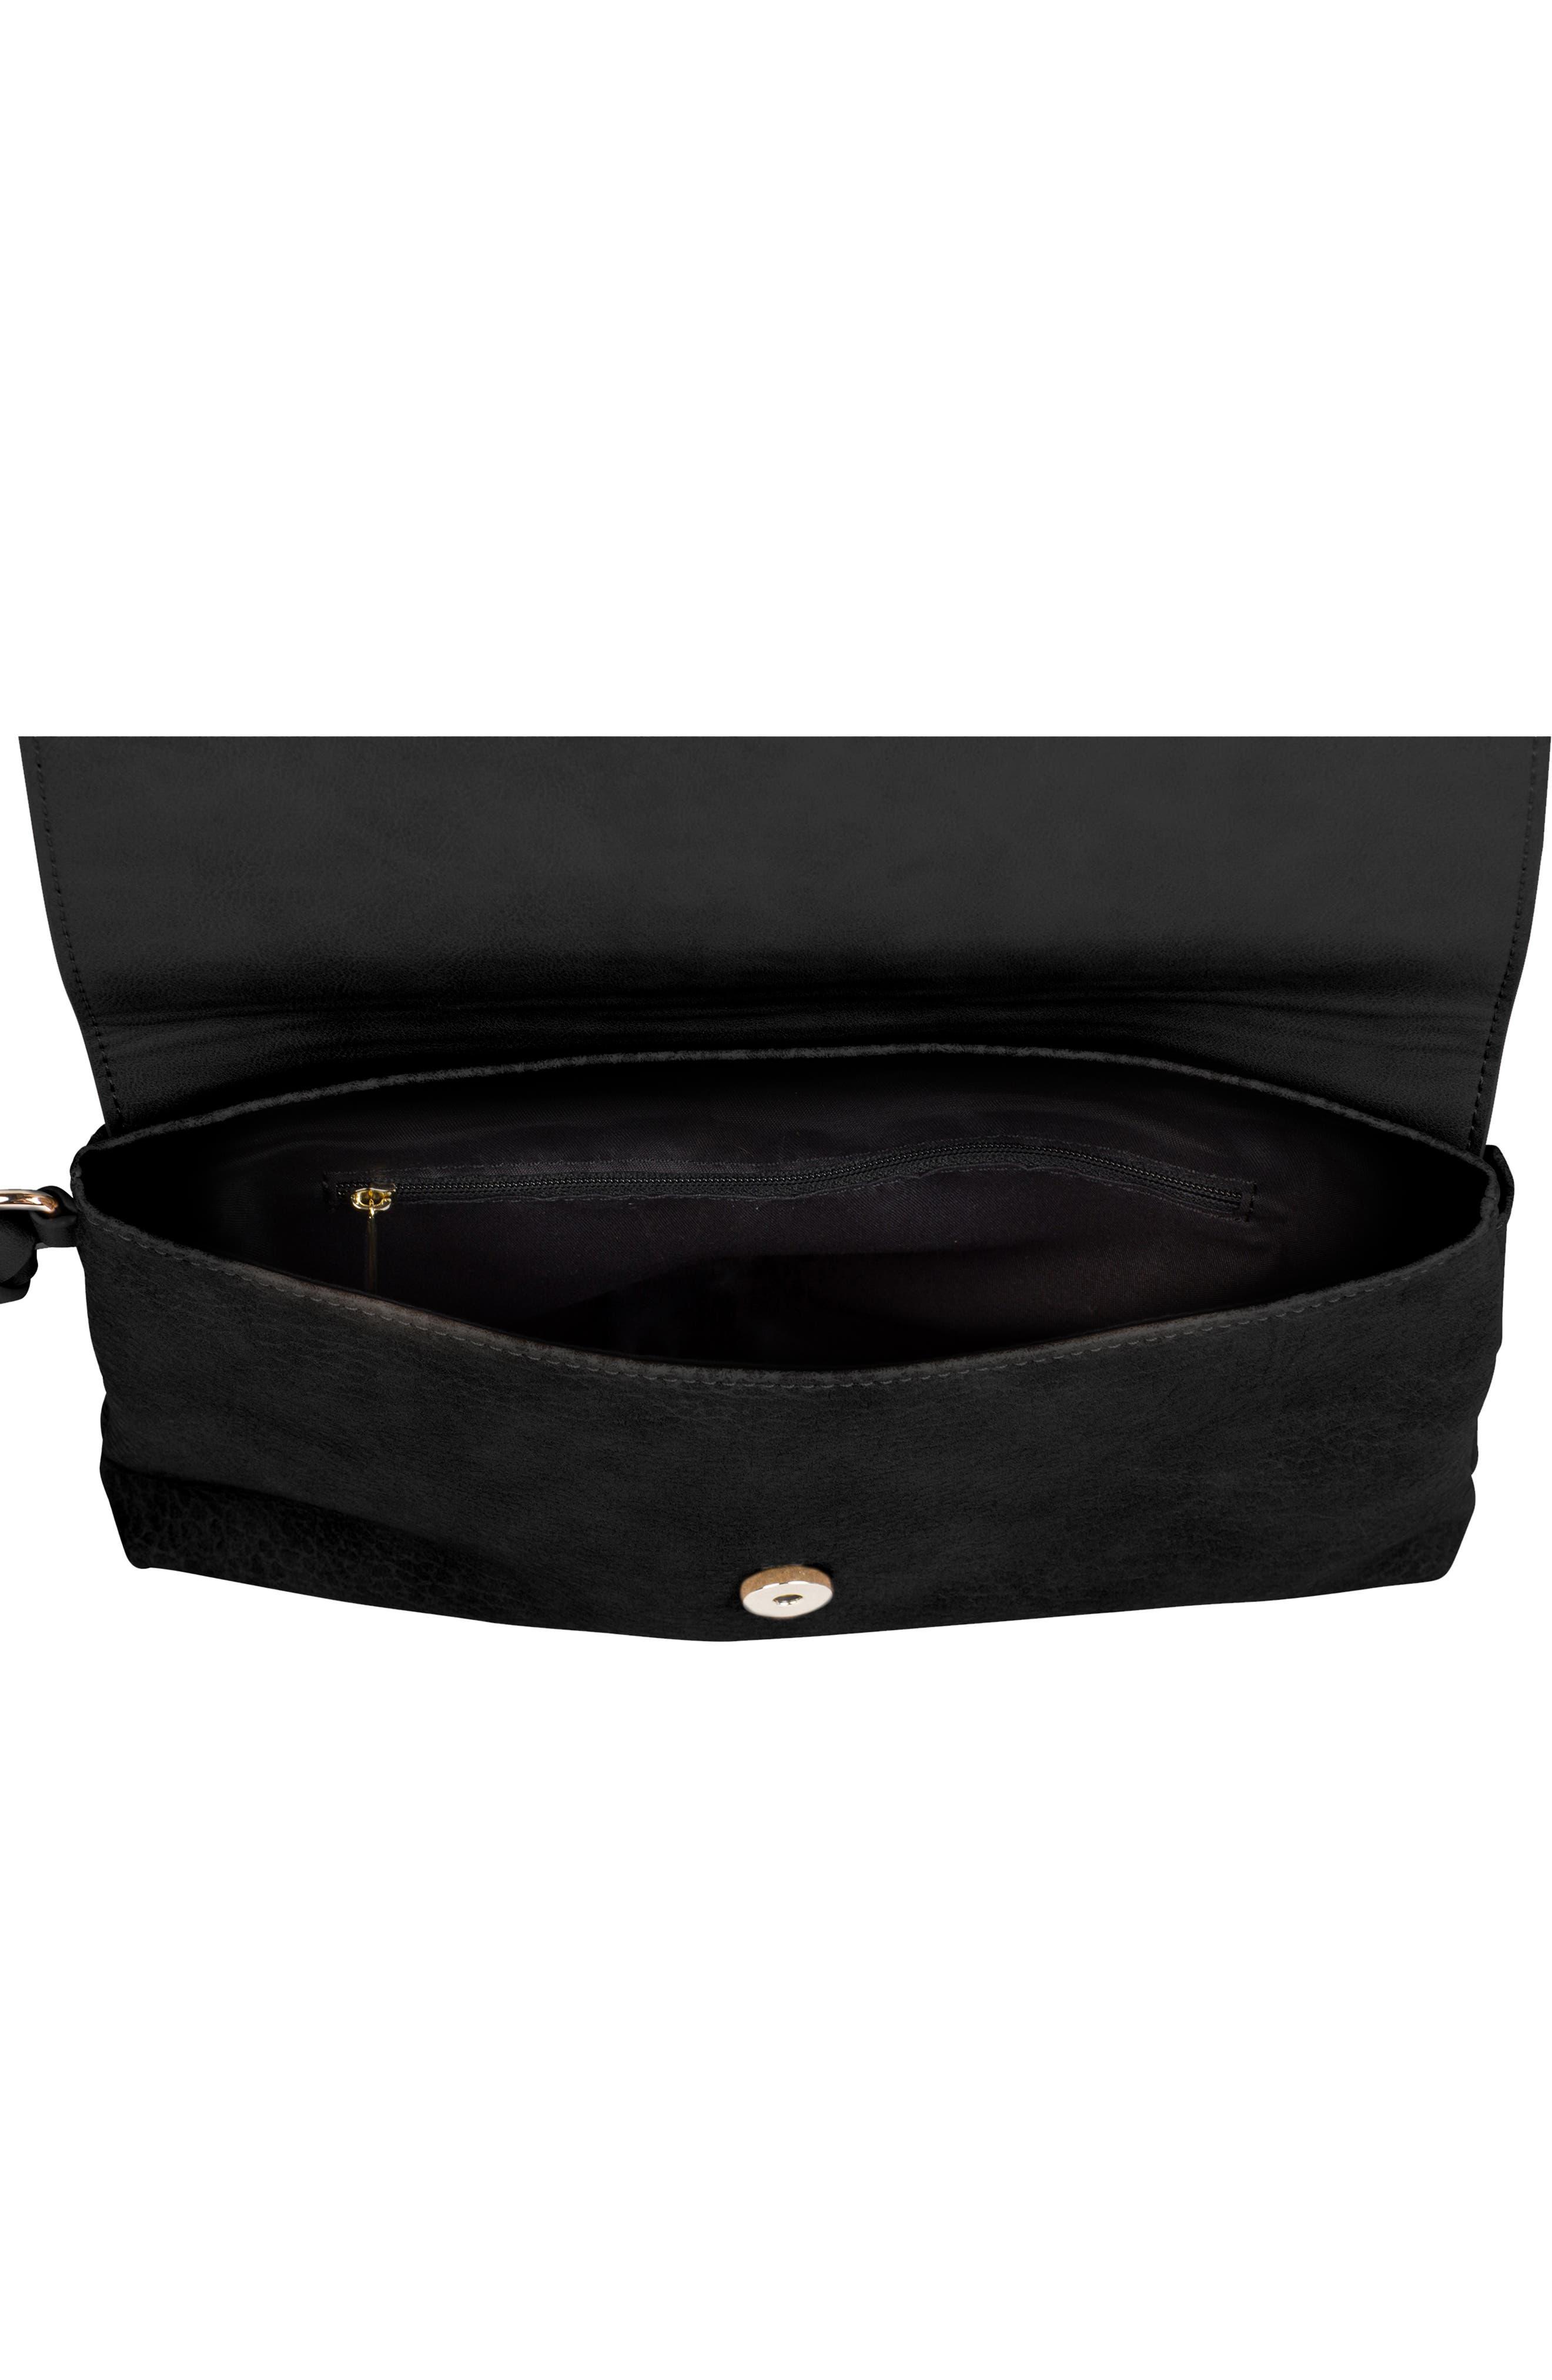 Custom Vegan Leather Wristlet Clutch,                             Alternate thumbnail 2, color,                             BLACK